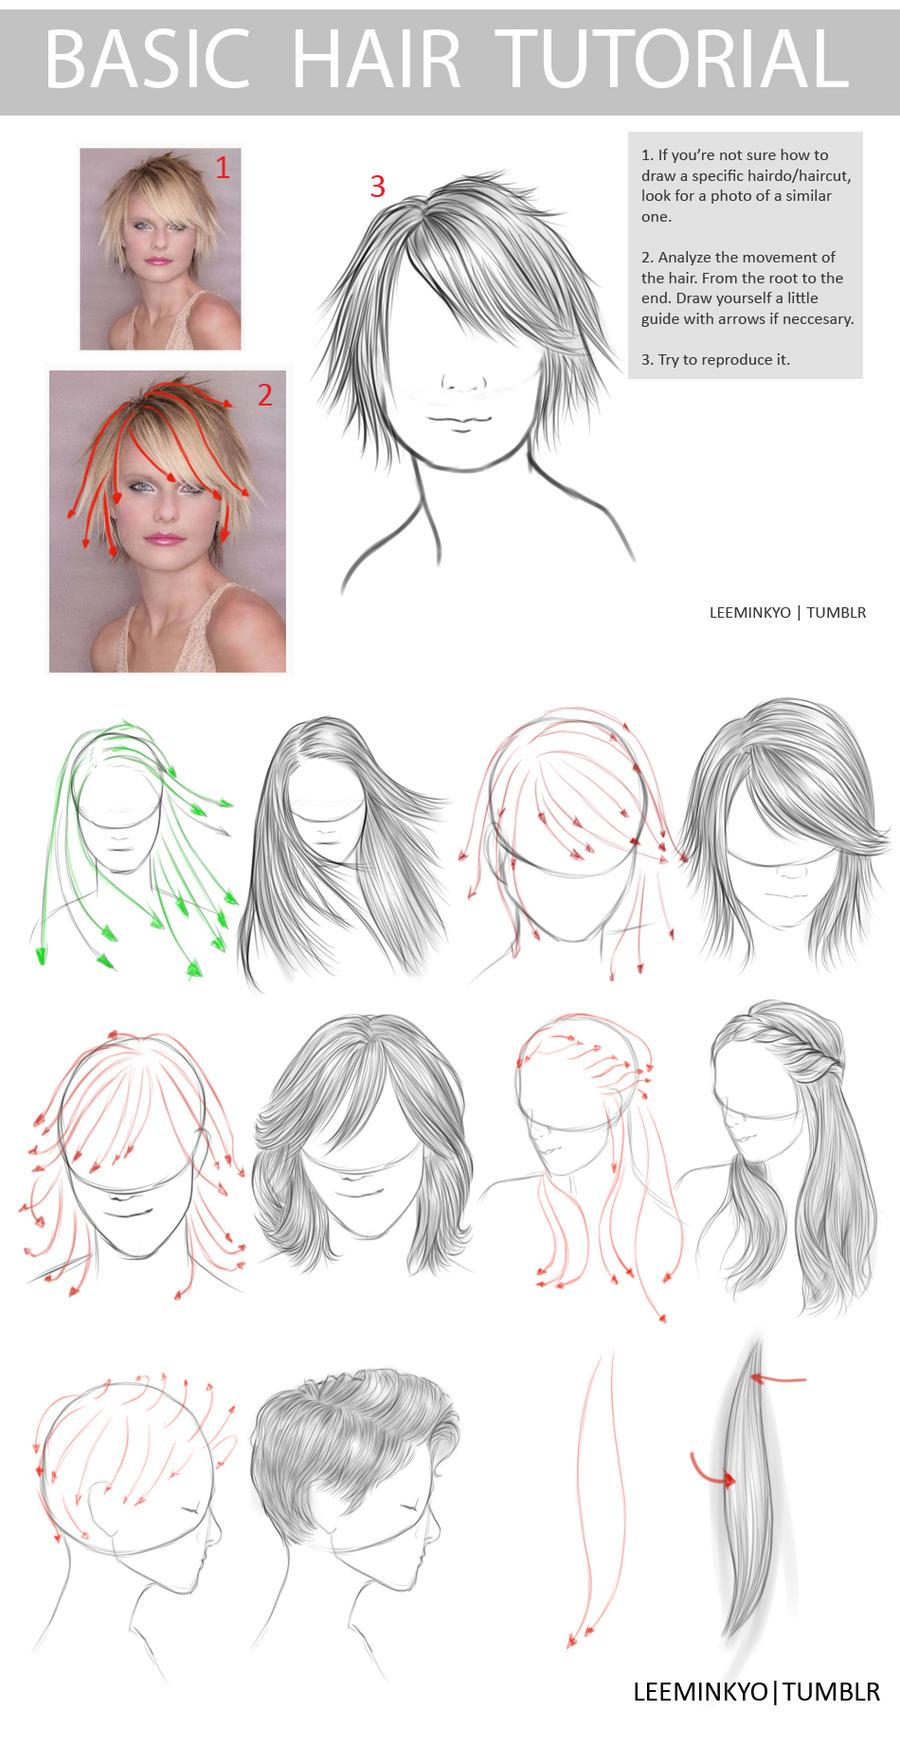 Basic hair tutorial - hair styles by LeeMinKyo on DeviantArt